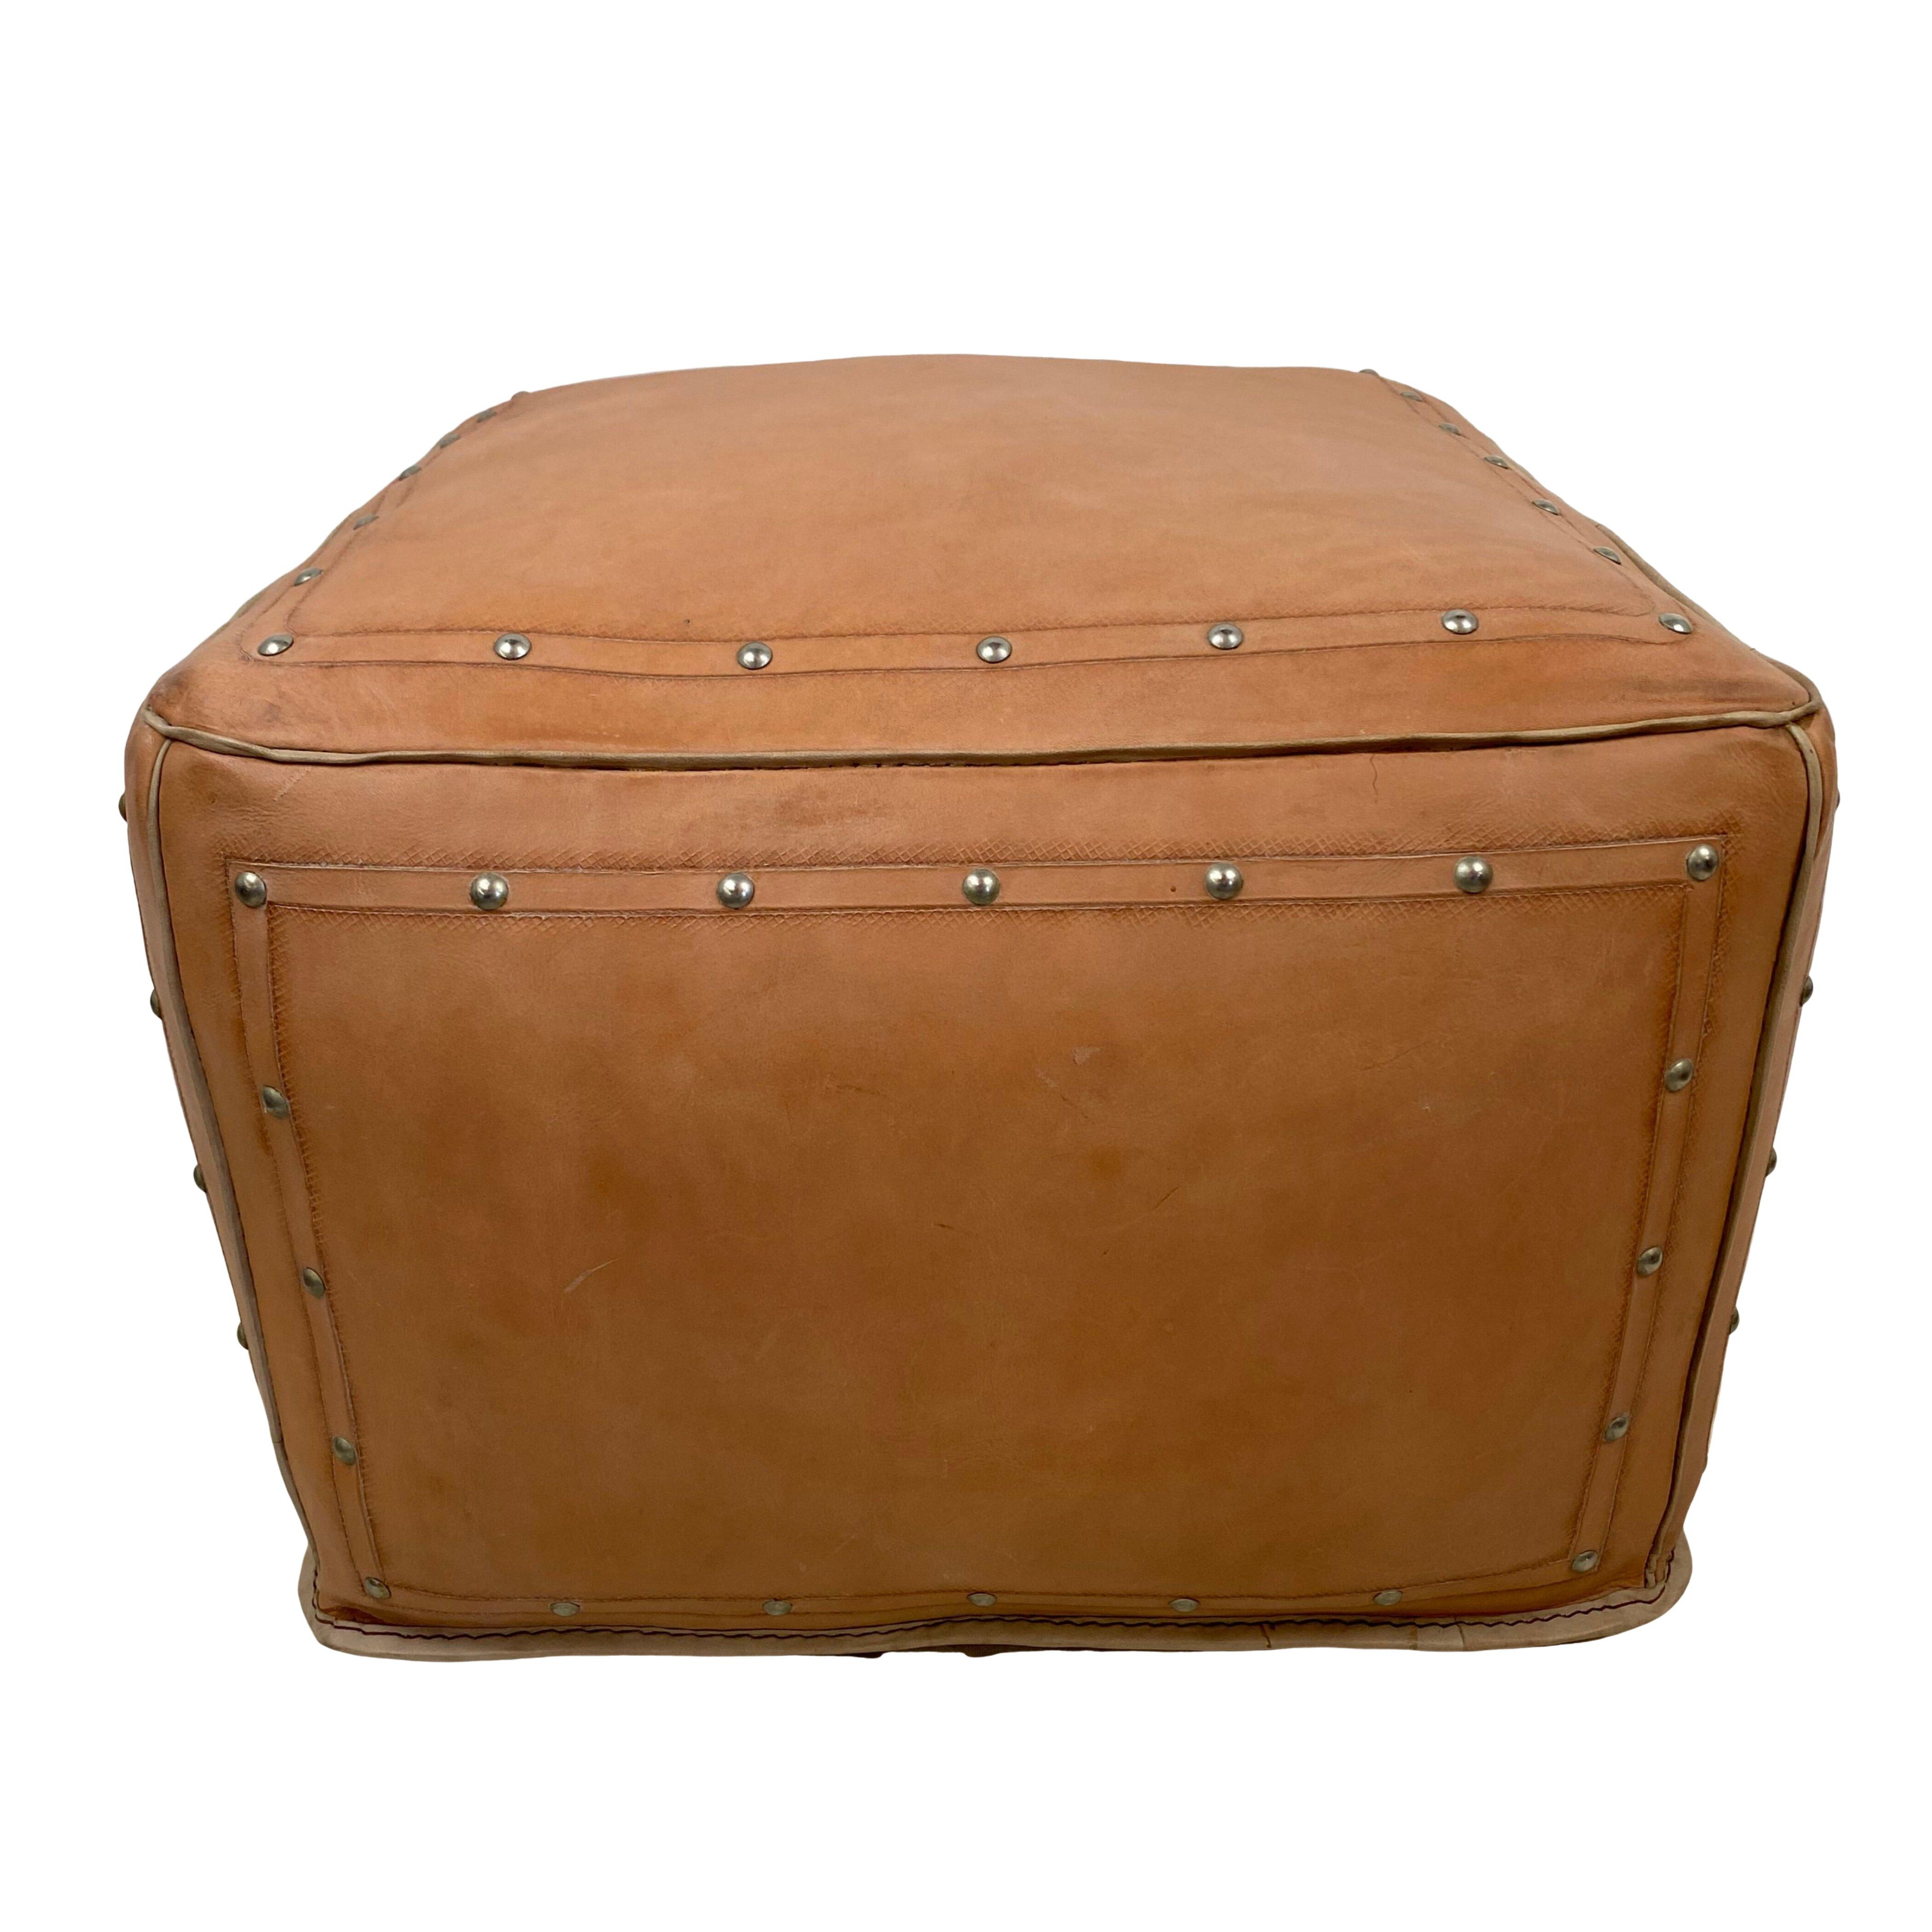 Foundry Select Wardle 18 Genuine Leather Square Pouf Ottoman Wayfair